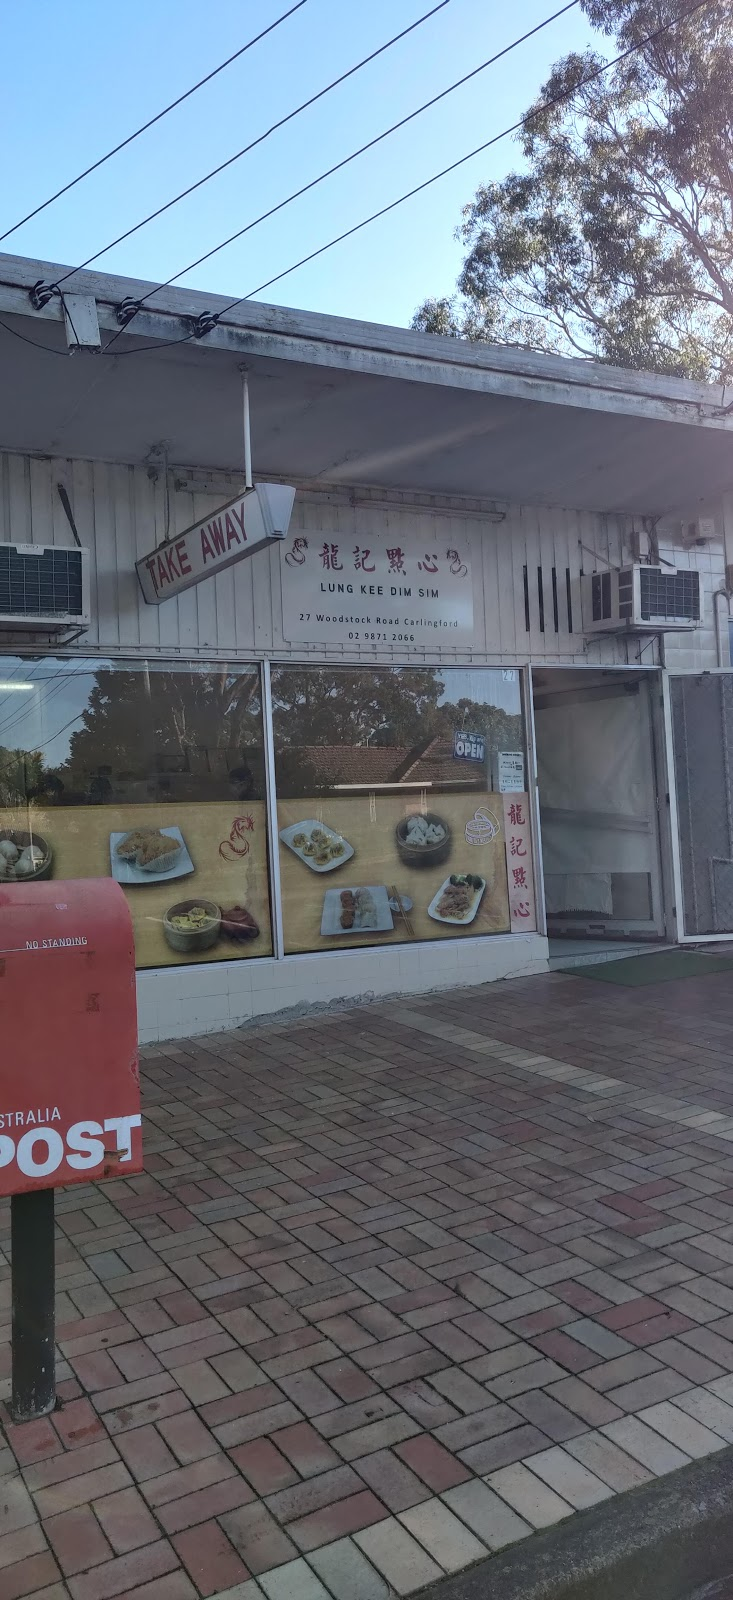 Lung Kee Dim Sum | food | 27 Woodstock Rd, Carlingford NSW 2118, Australia | 0298712066 OR +61 2 9871 2066